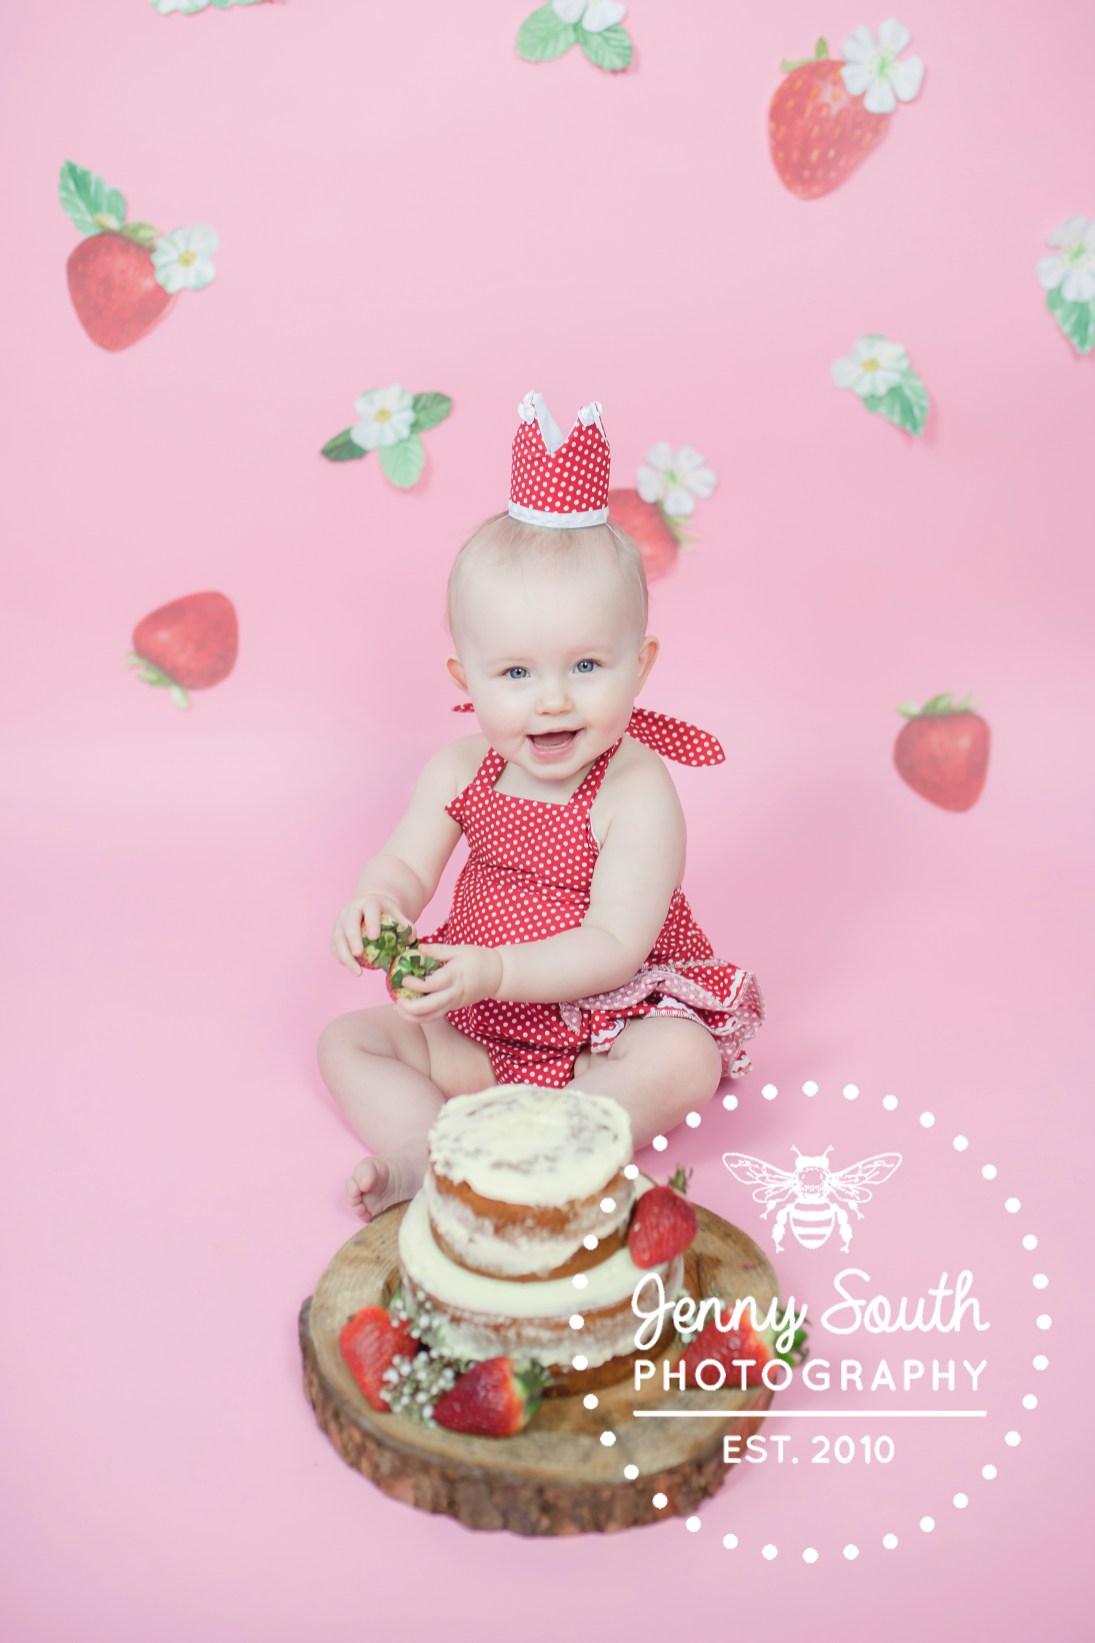 Baby girl enjoying her strawberry themed cake smash